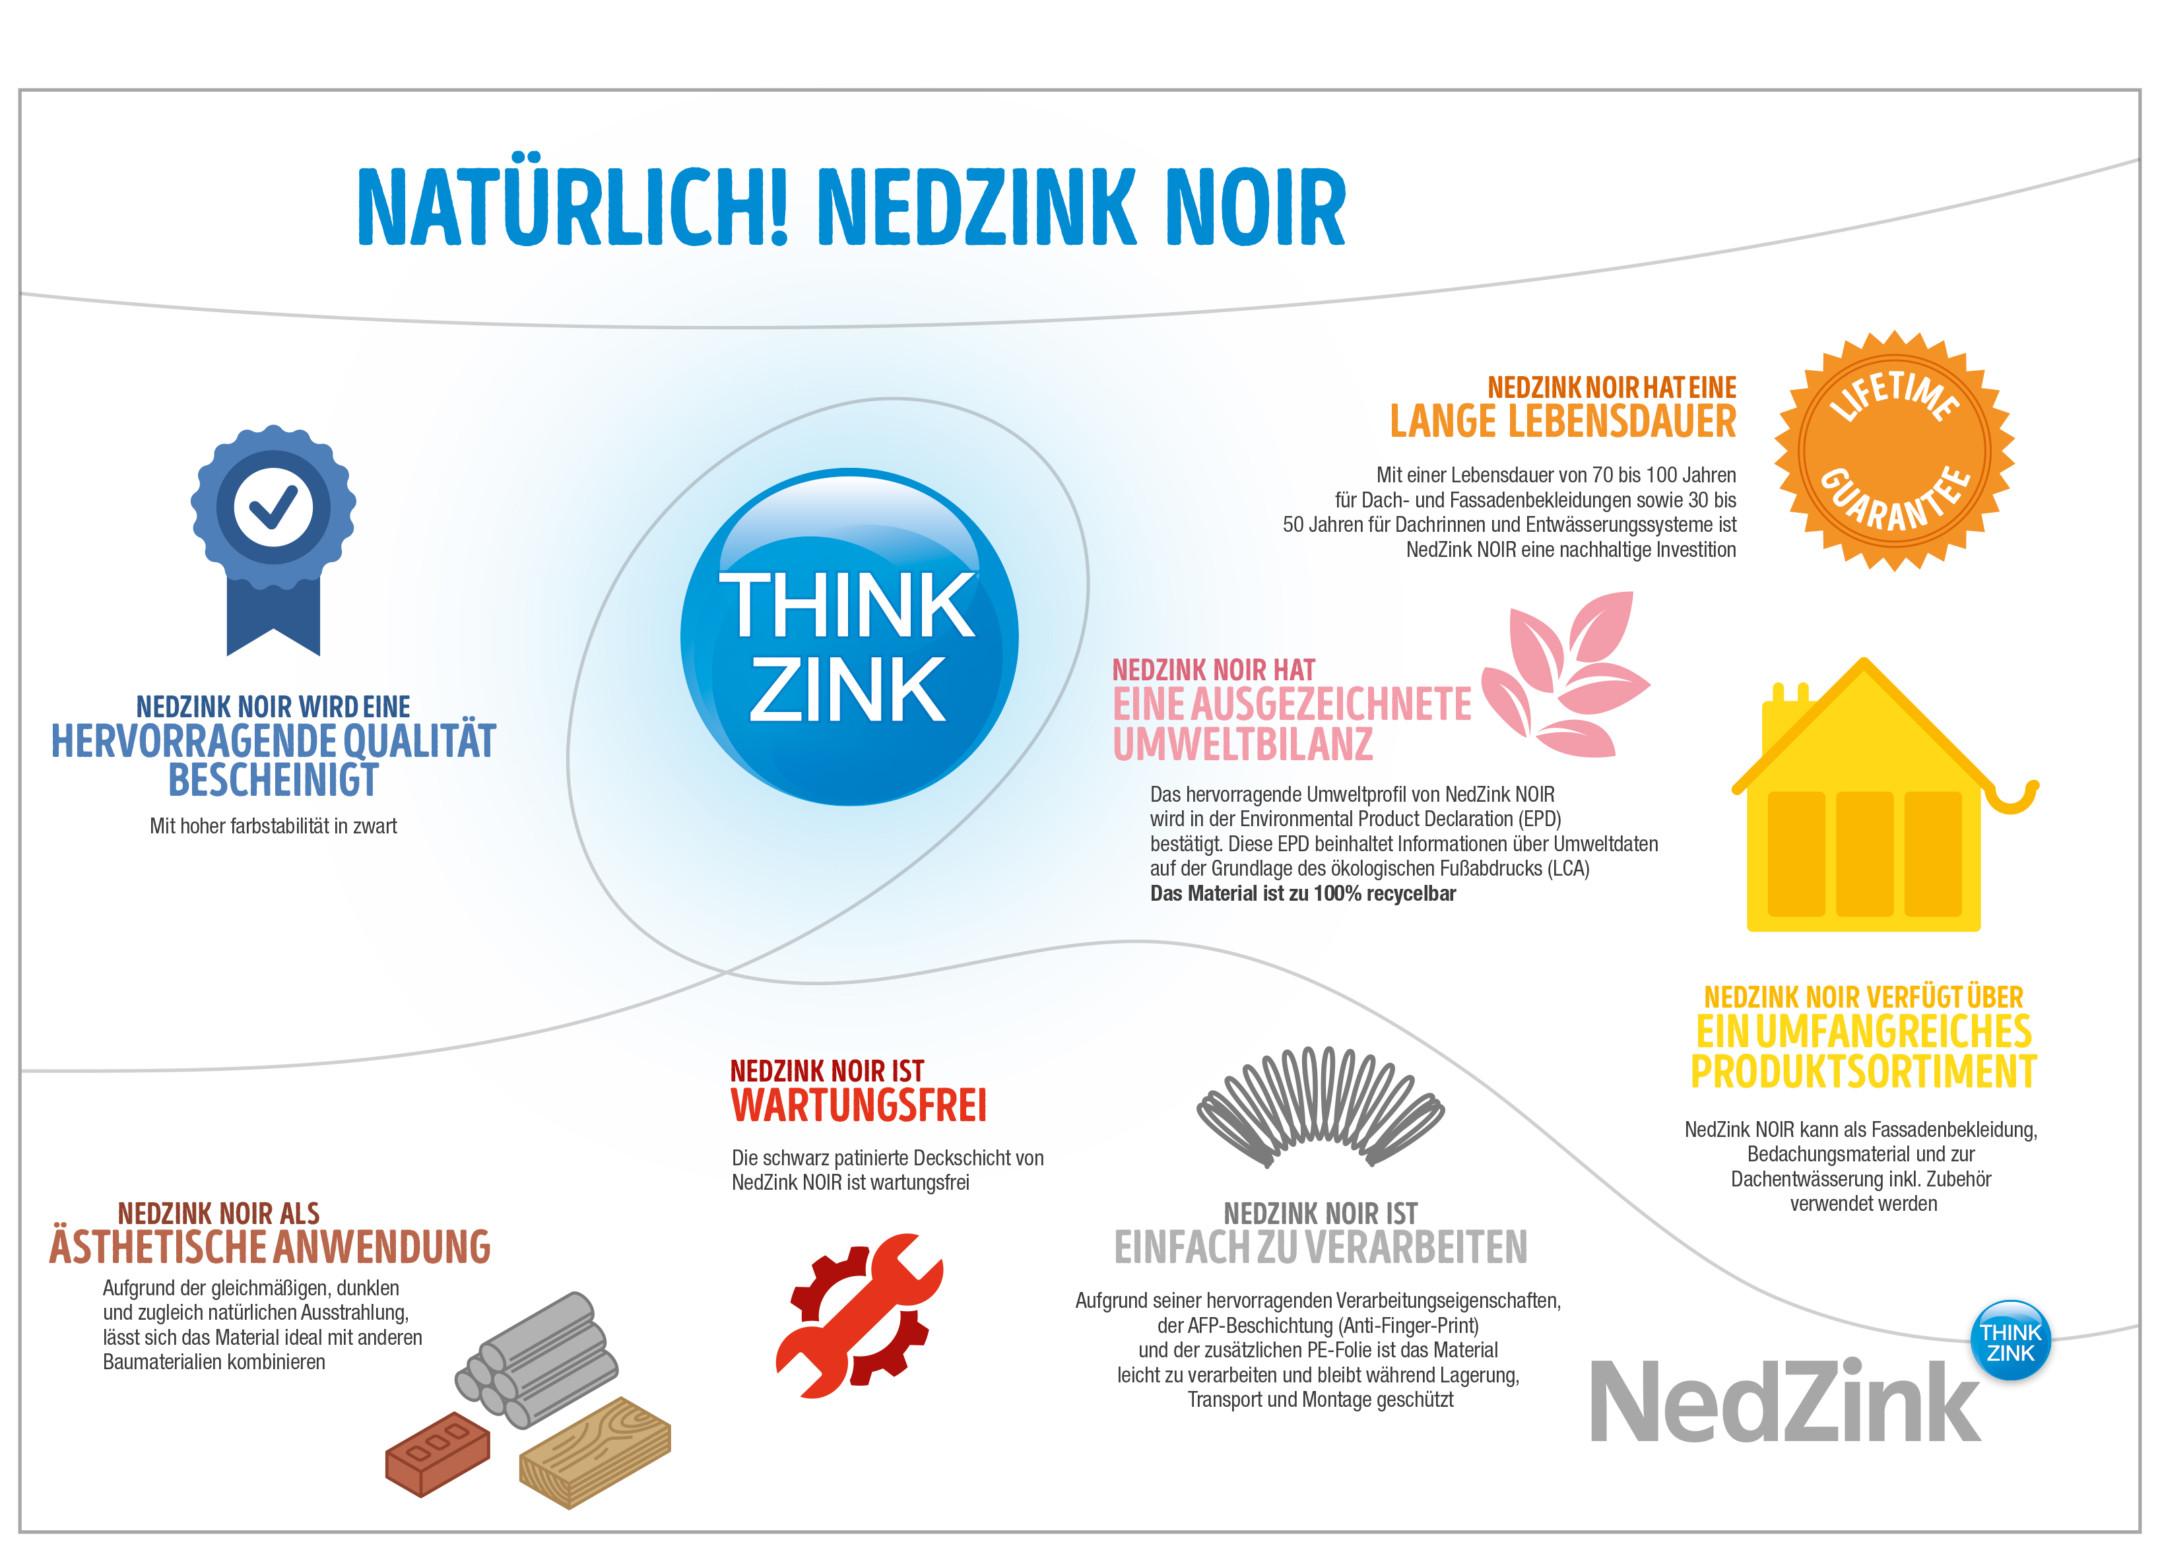 29432-nz-infographic-nedzink-noir-du-wo-garanty